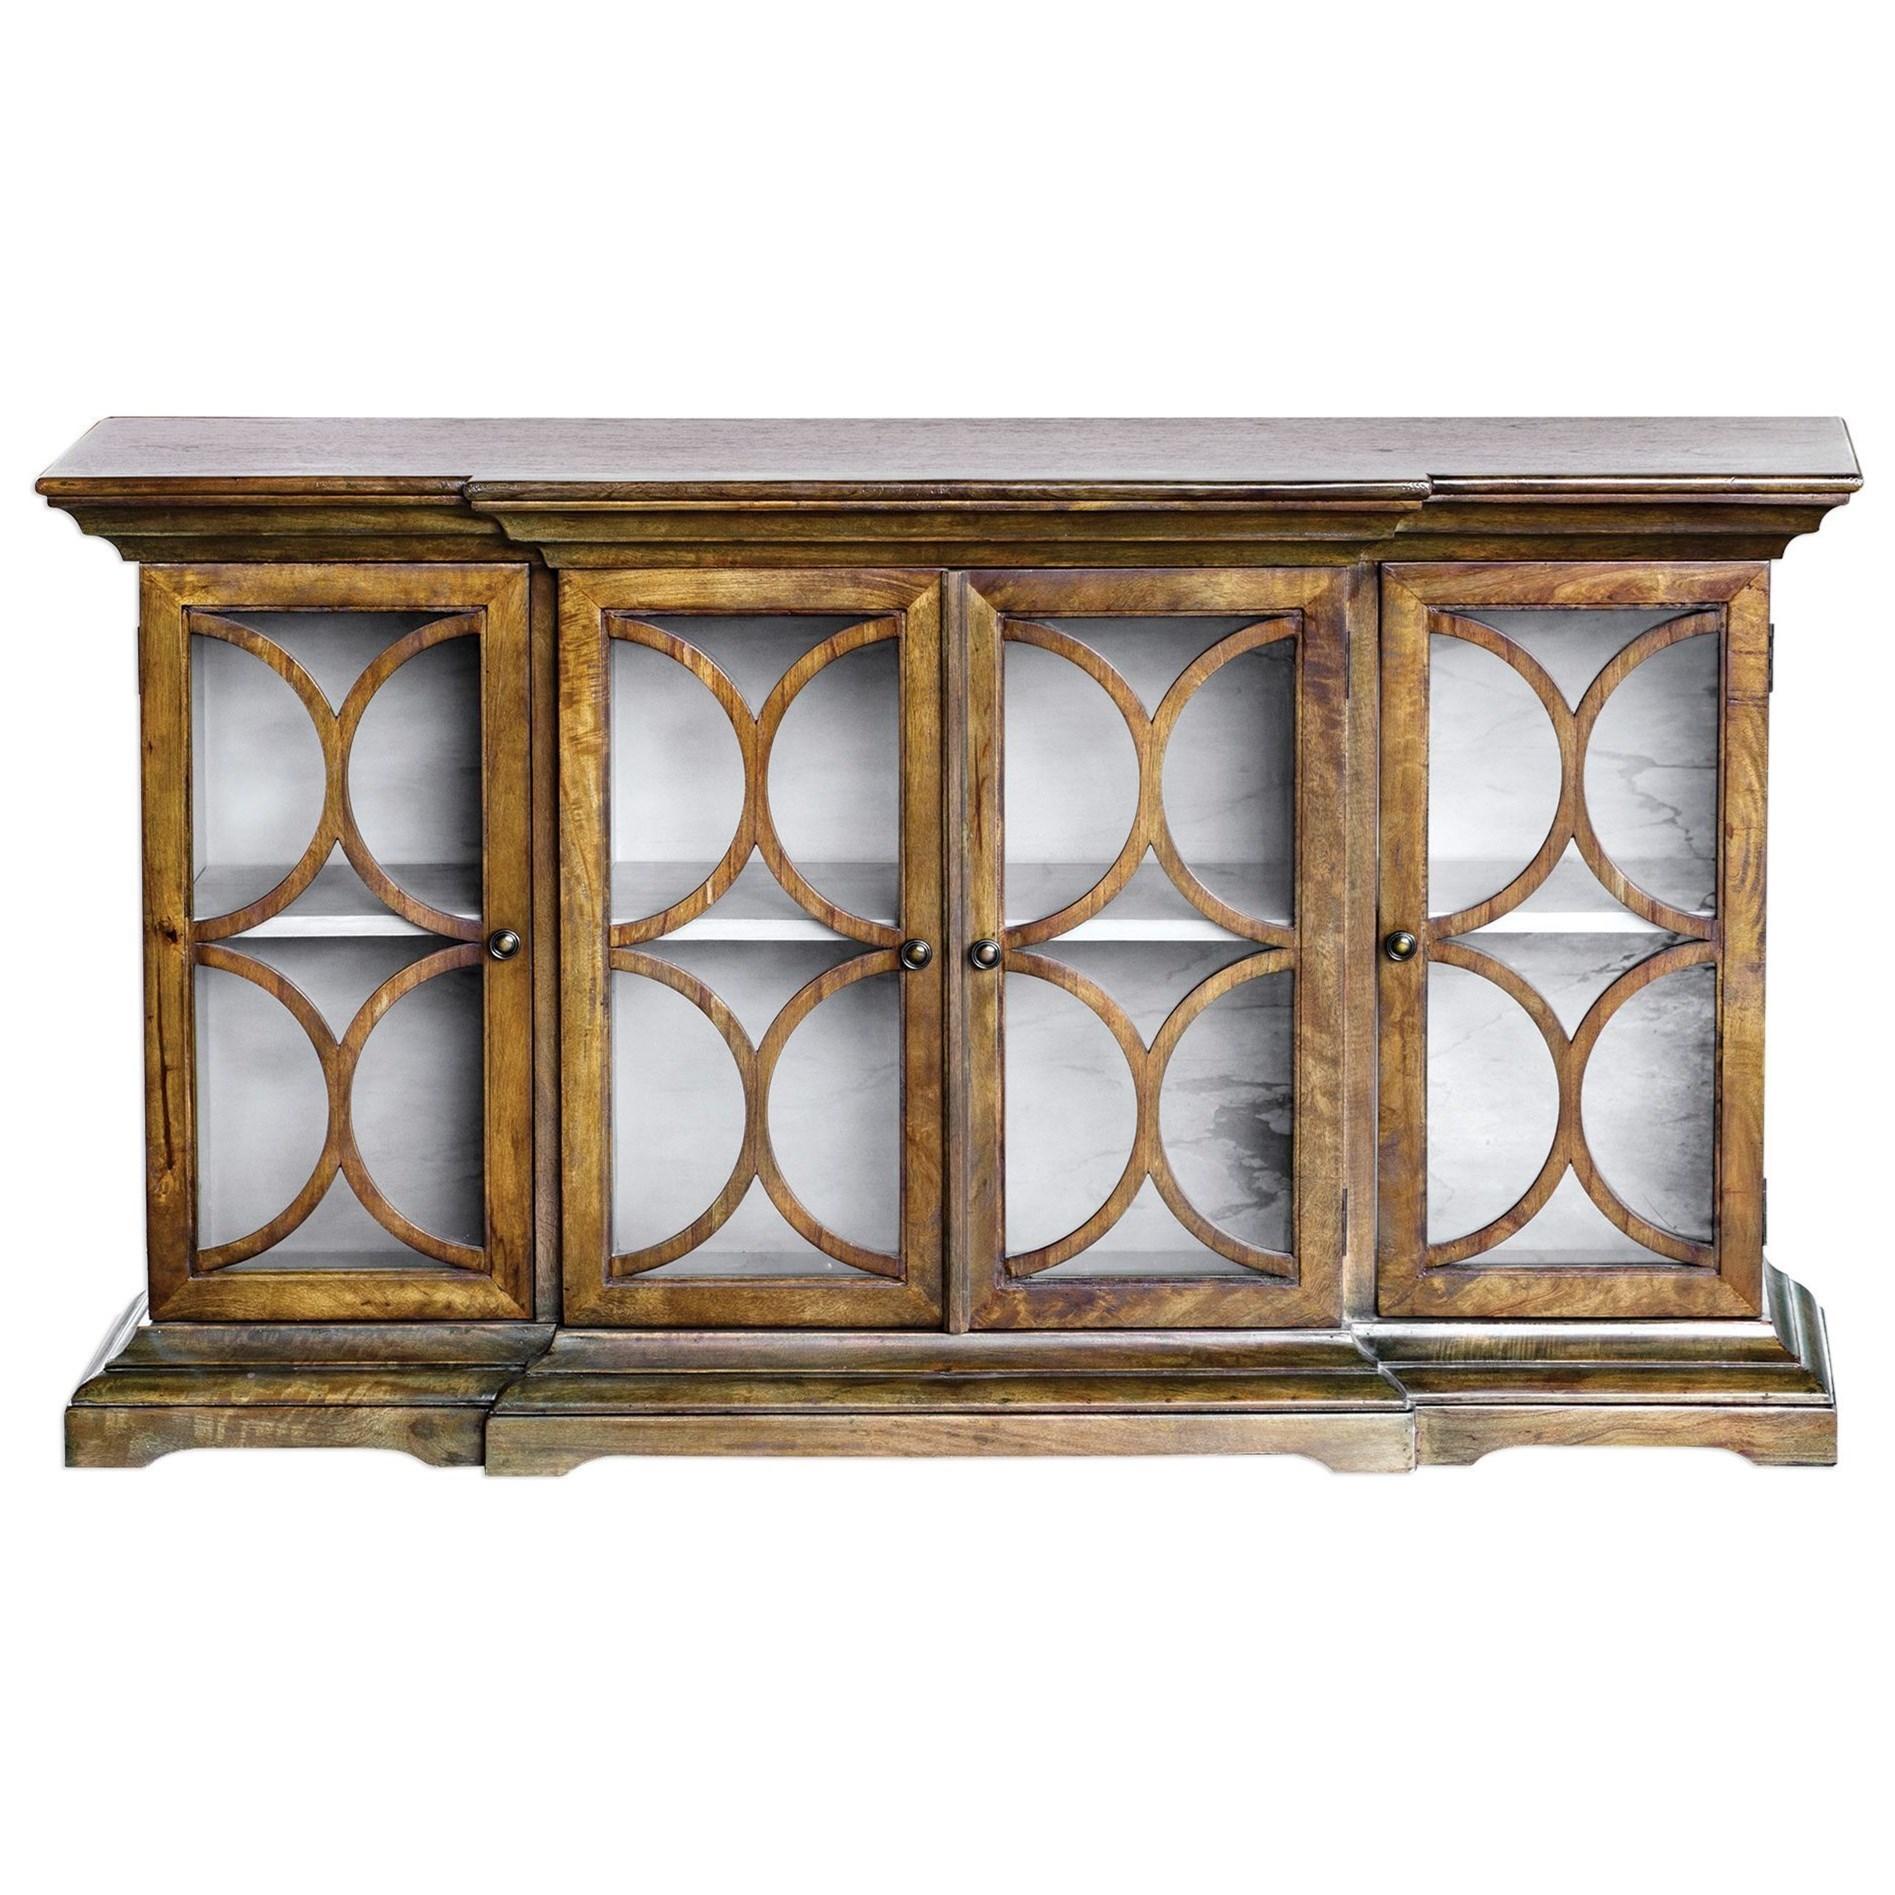 Uttermost Accent Furniture Chests 25895 Belino Mist 4 Door Cabinet